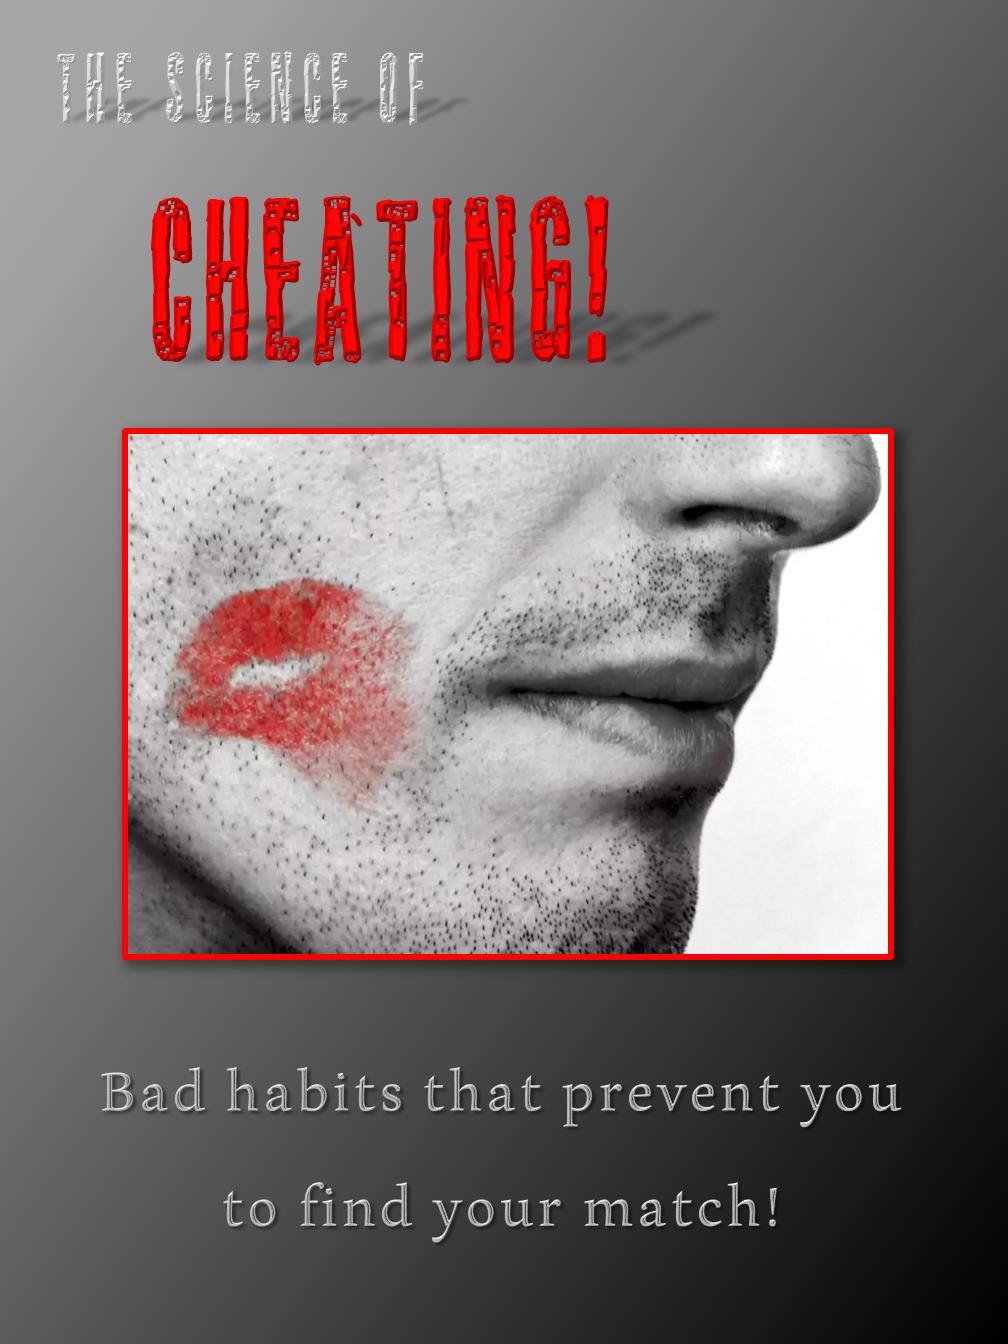 Cheating!